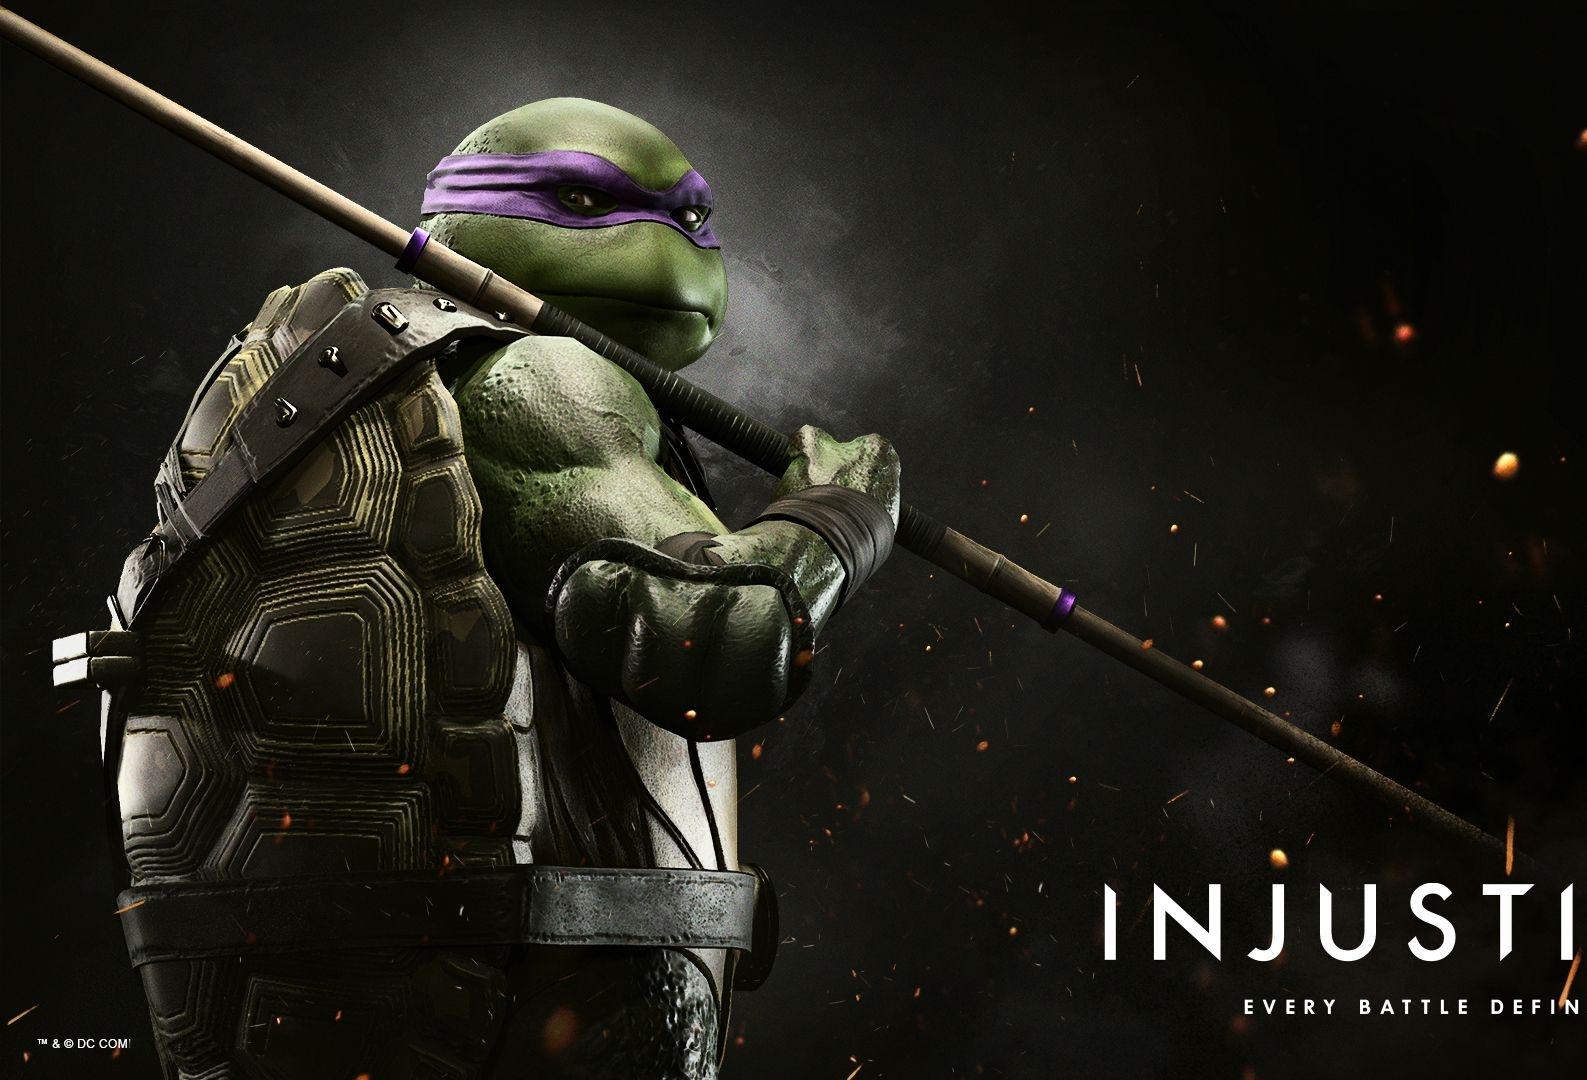 Donatello Injustice 2 Png Injustice 2 Injustice Darth